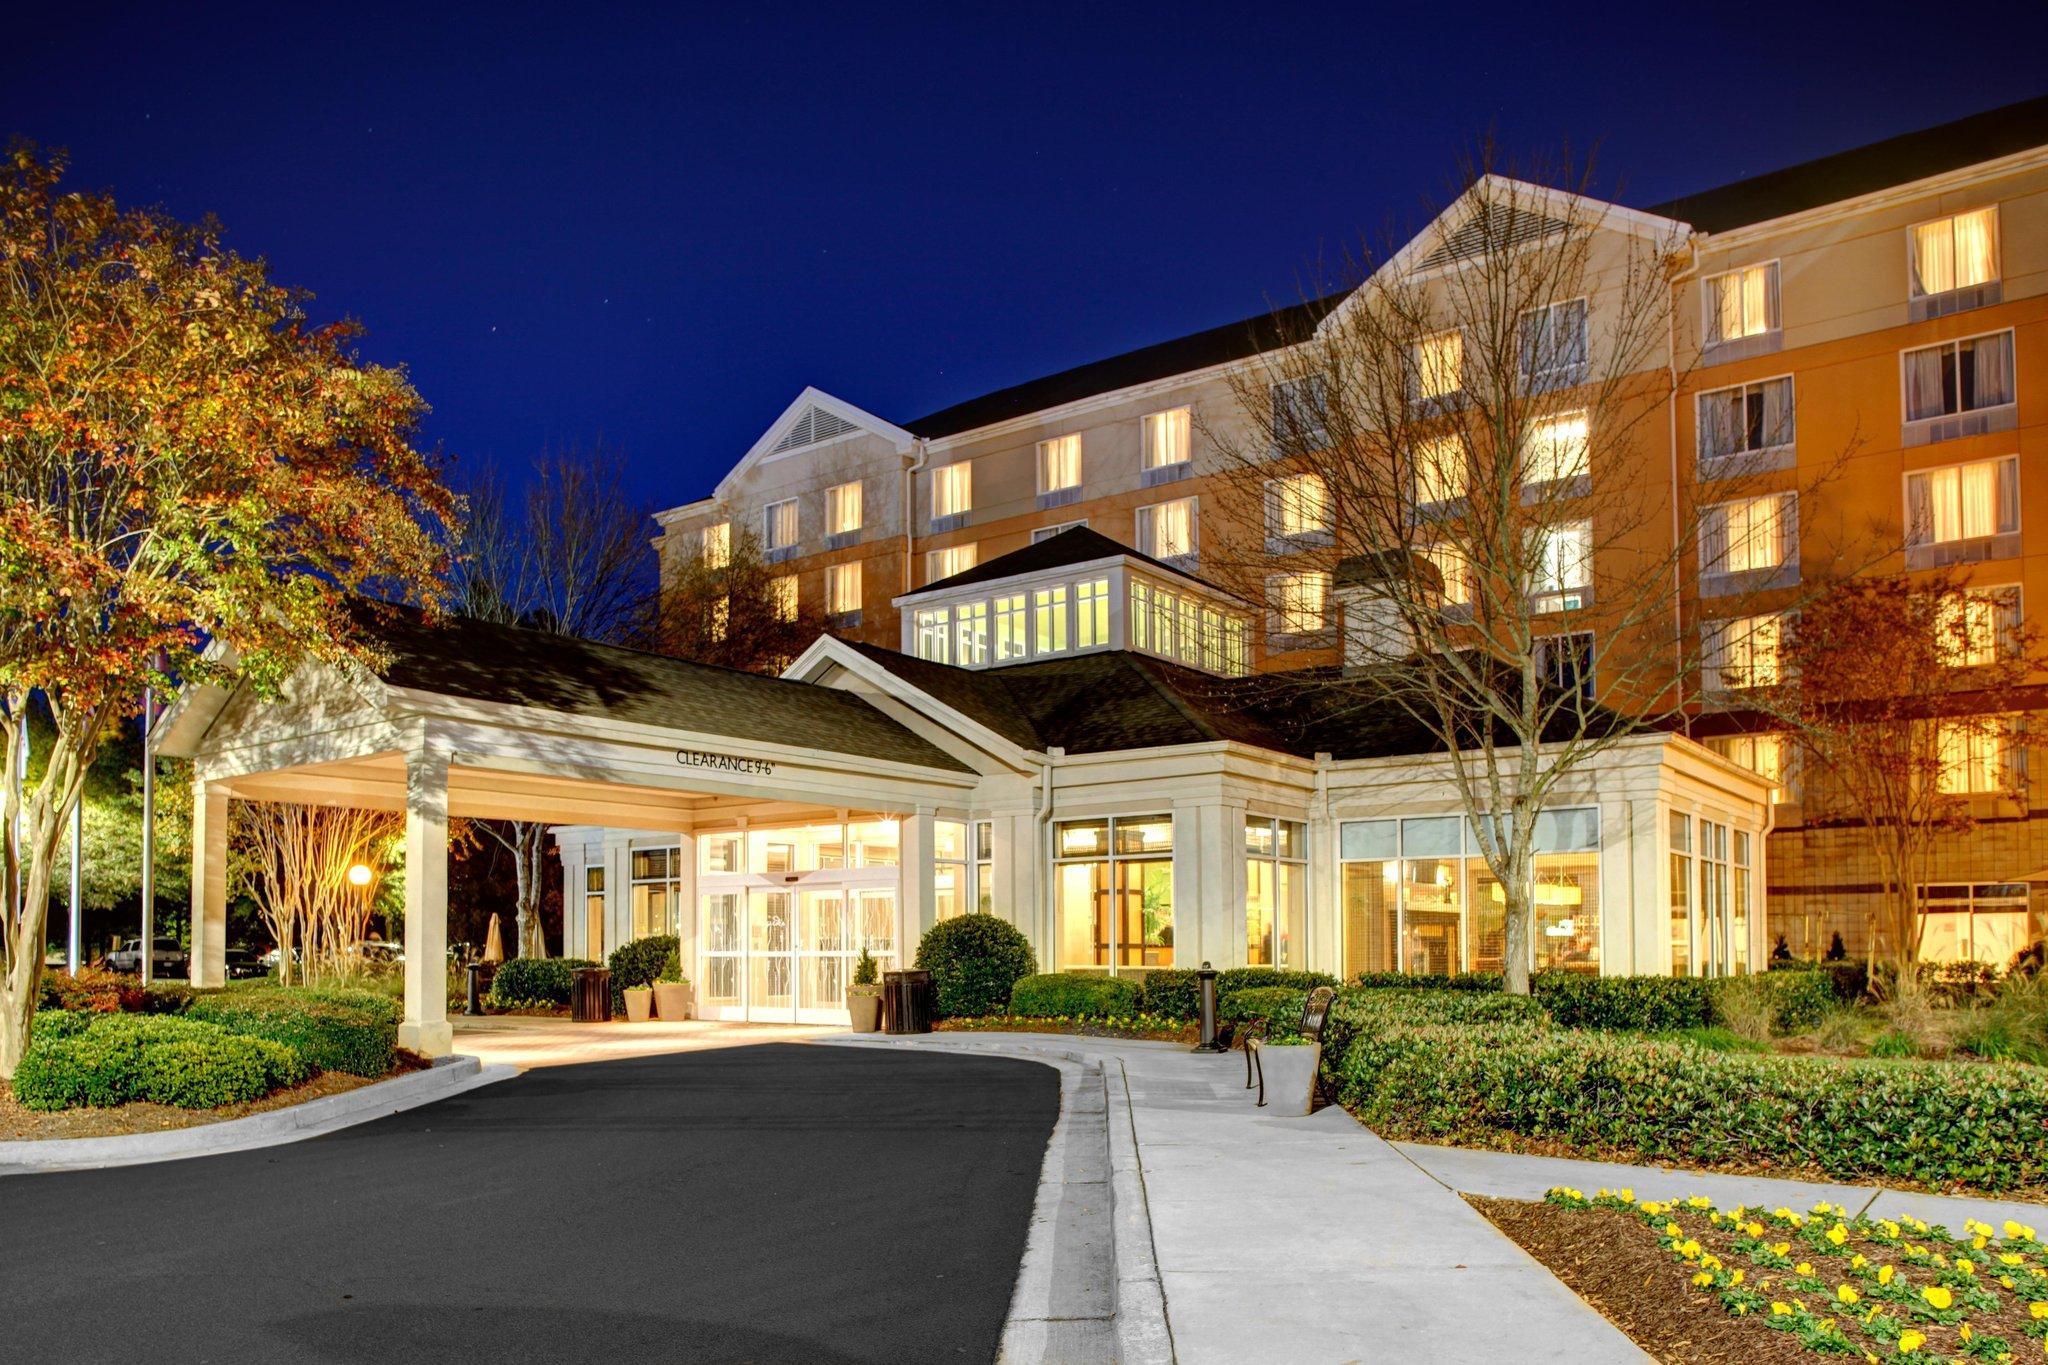 Hilton Garden Inn Atlanta North Alpharetta